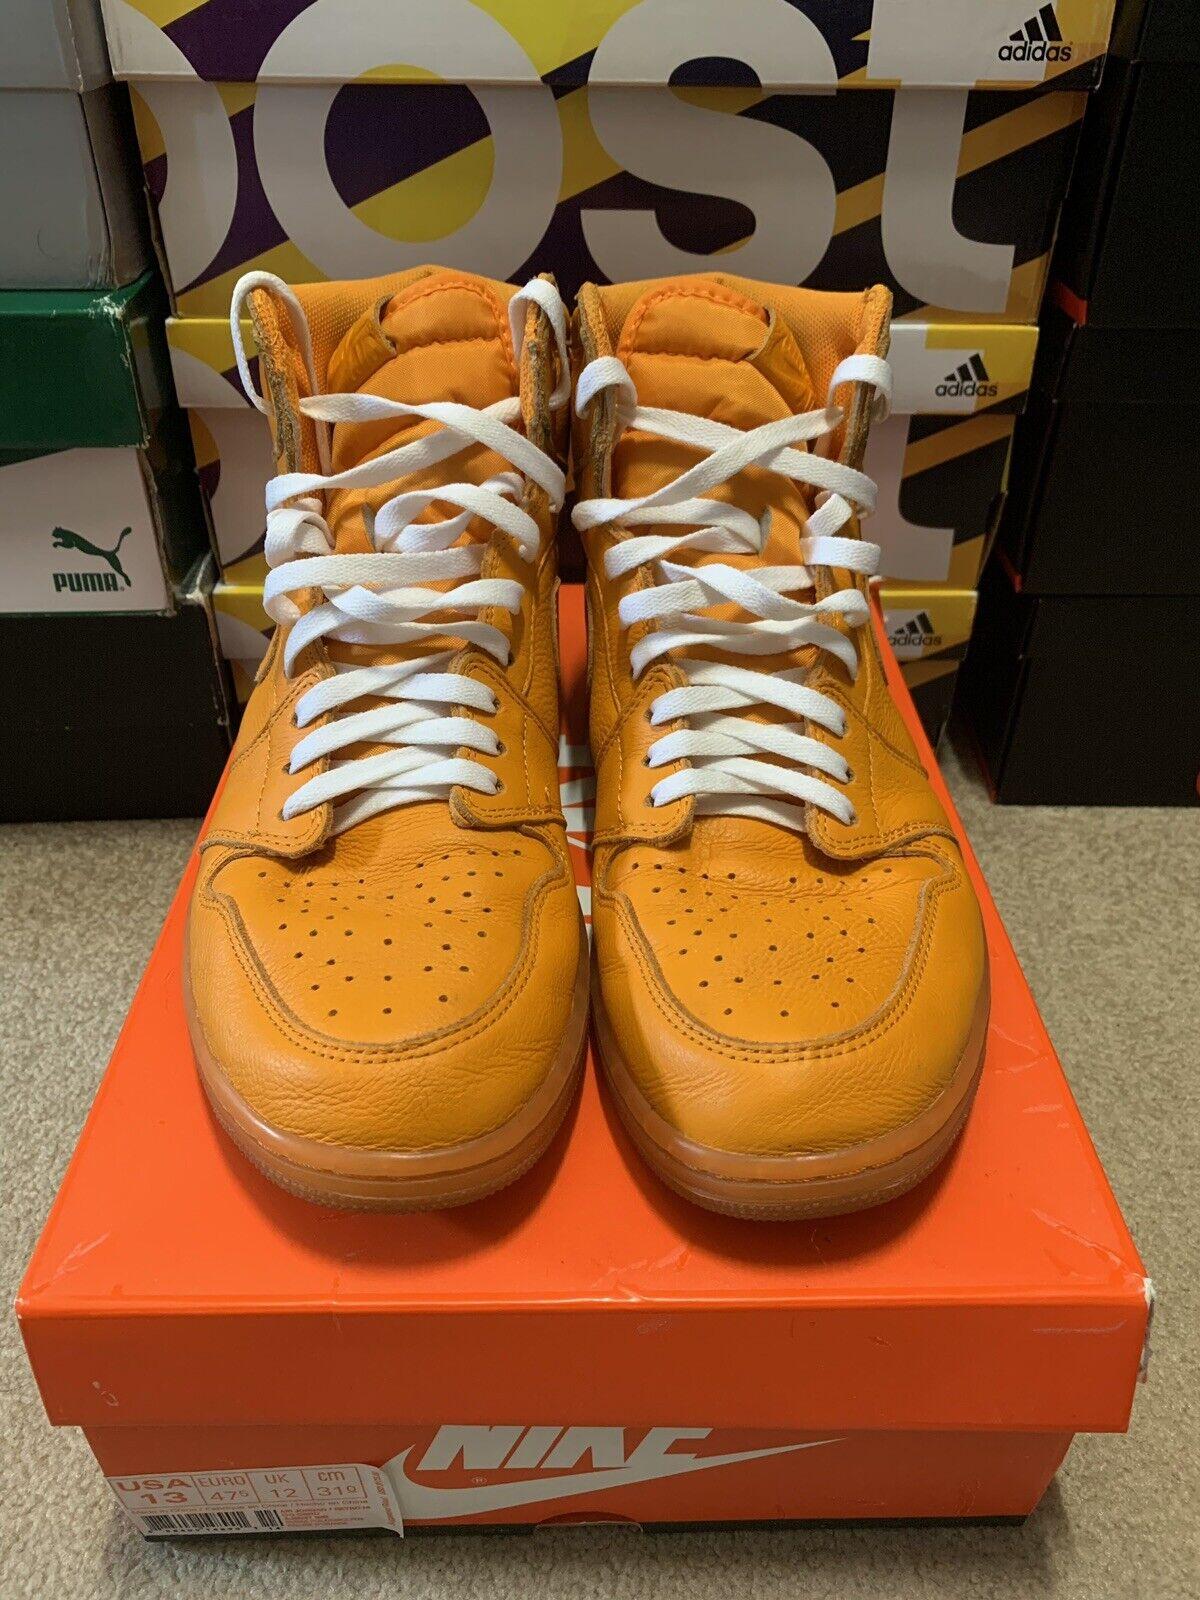 Jordan Retro 1 orange Peel Gatorade Size 13 2 4 5 6 7 8 9 10 11 12 14 15